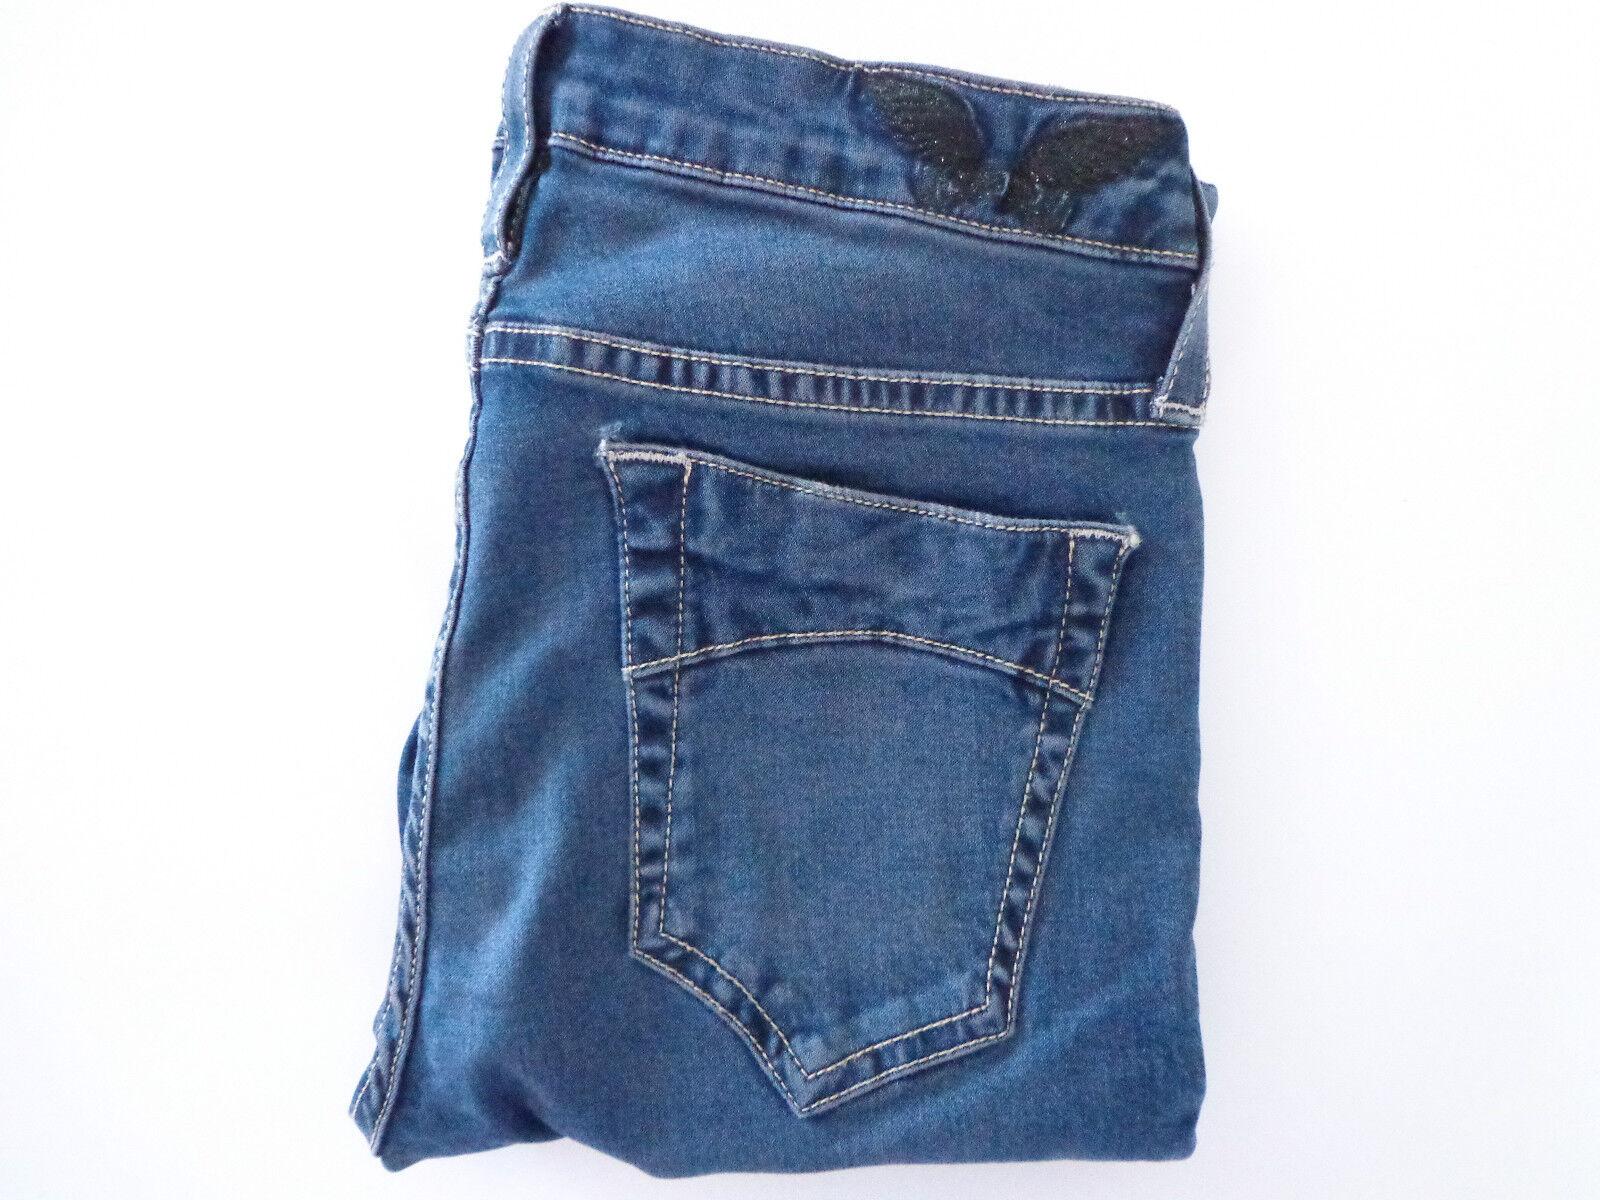 Robin's bluee jeans Jane stretch skinny mid rise silhouette  SZ 27 New